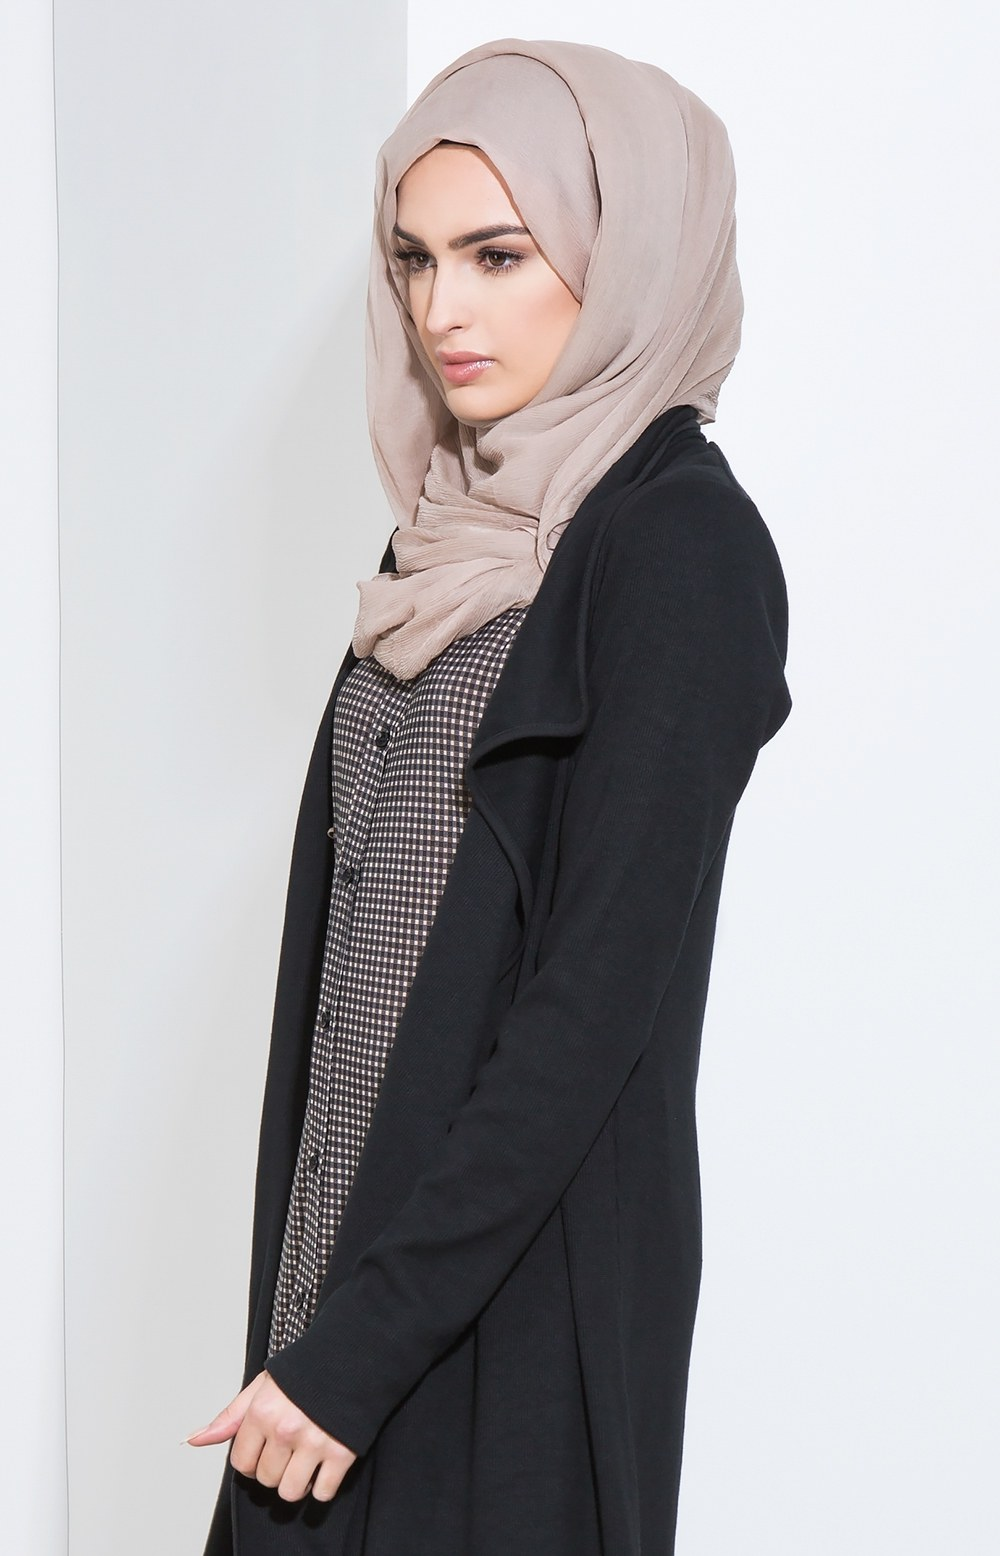 Bentuk Baju Lebaran Thn Ini J7do 25 Trend Model Baju Muslim Lebaran 2018 Simple & Modis